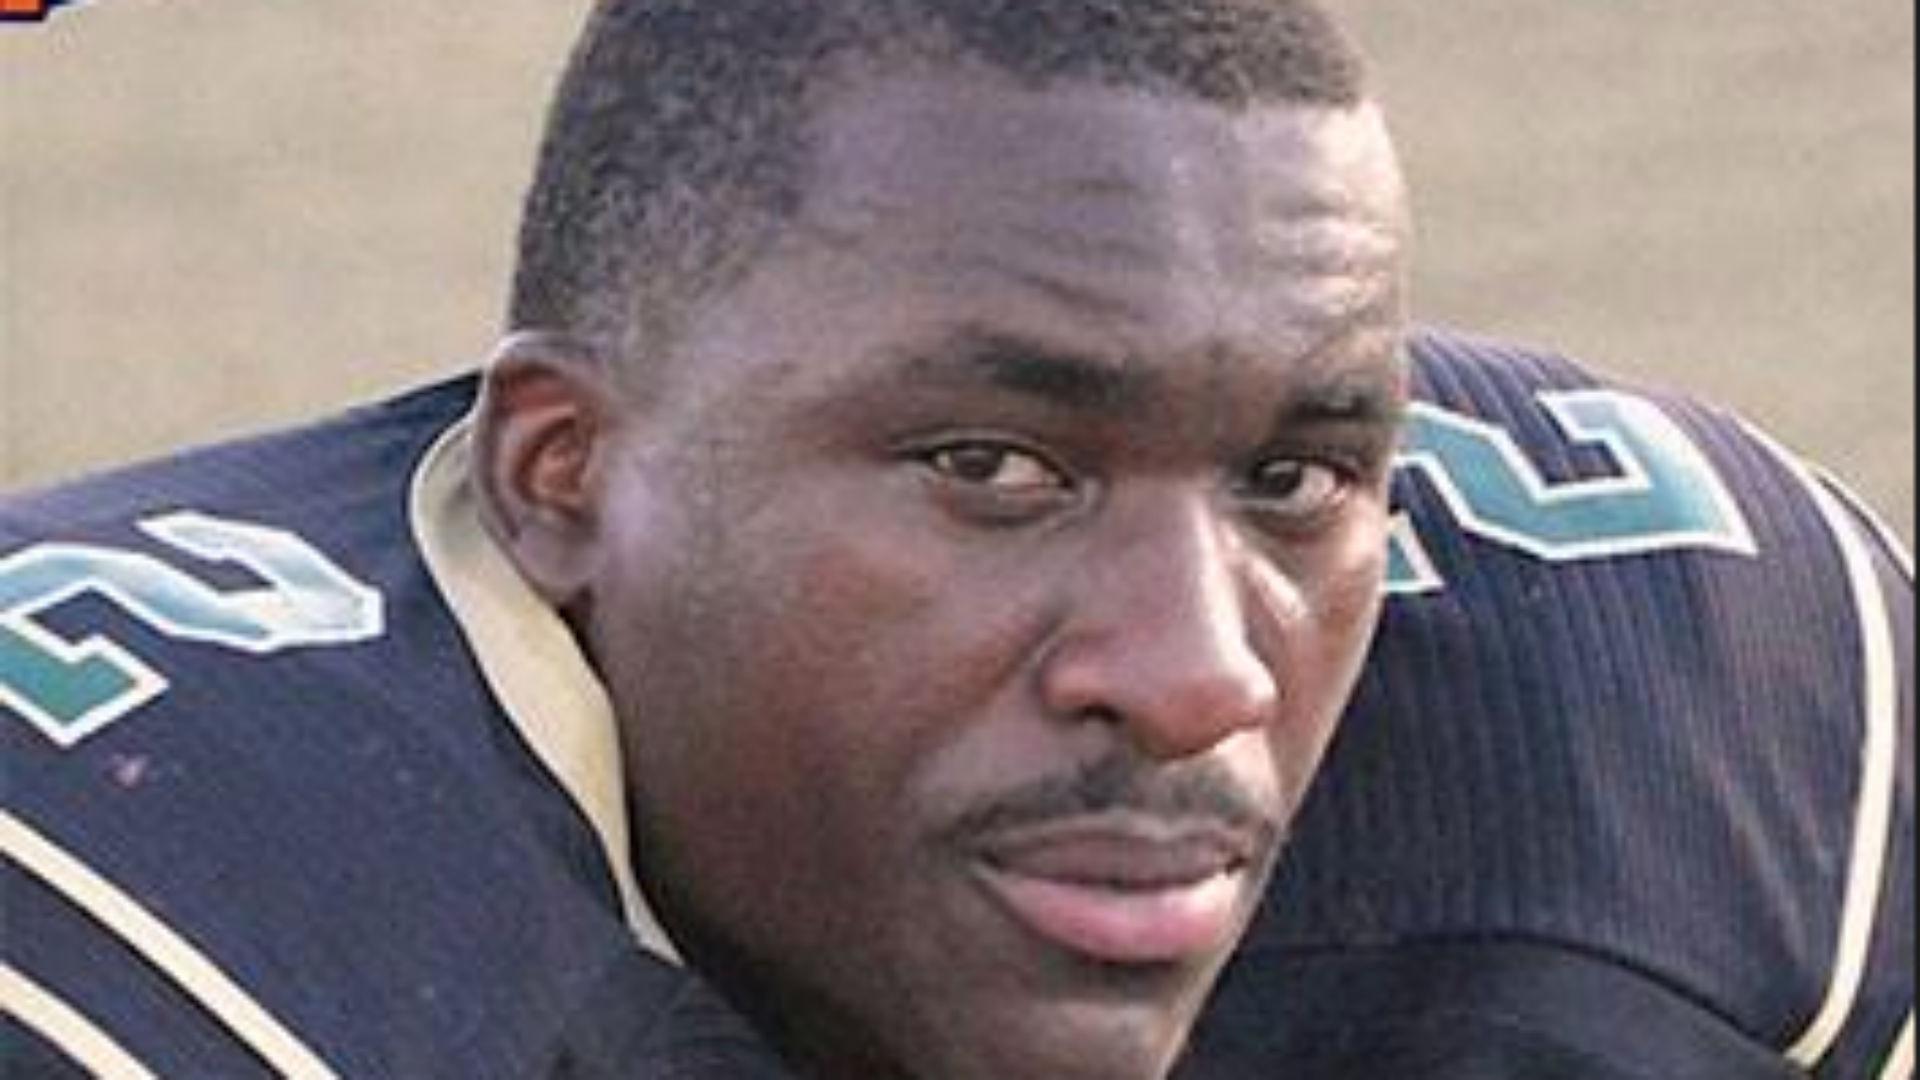 auburn's 18-year-old commit has very mature look | ncaa football